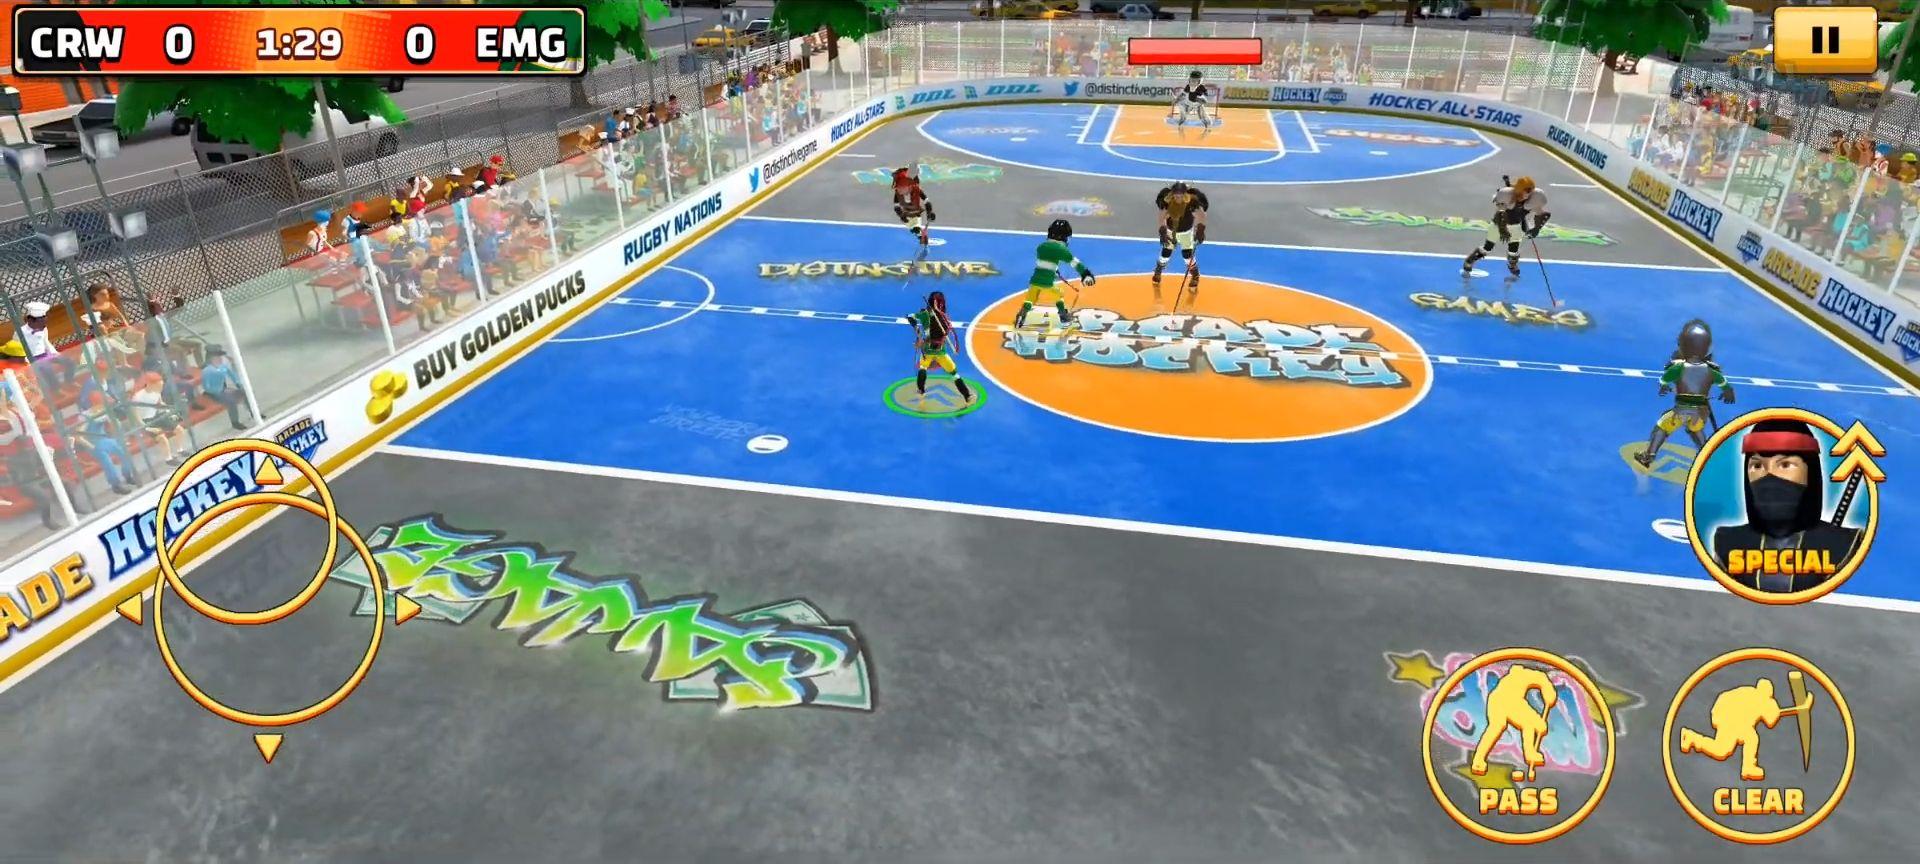 Arcade Hockey 21 captura de tela 1